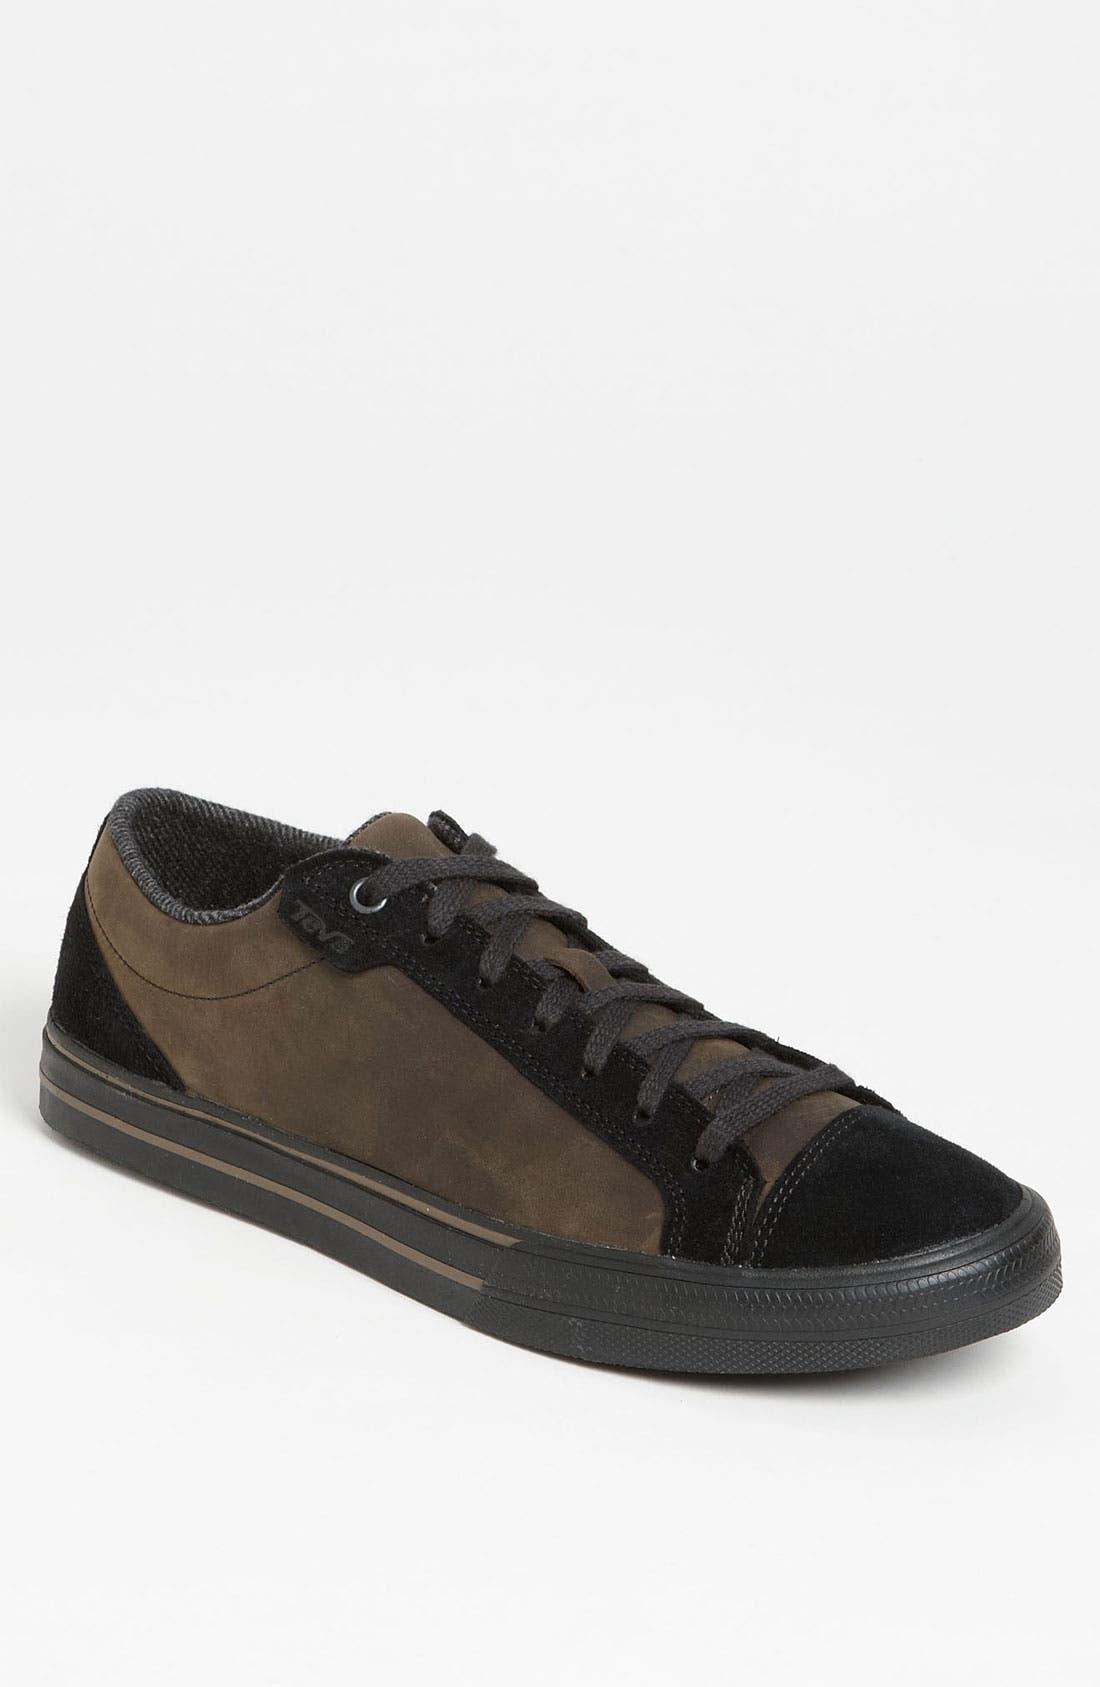 Alternate Image 1 Selected - Teva 'Roller' Sneaker (Online Only)